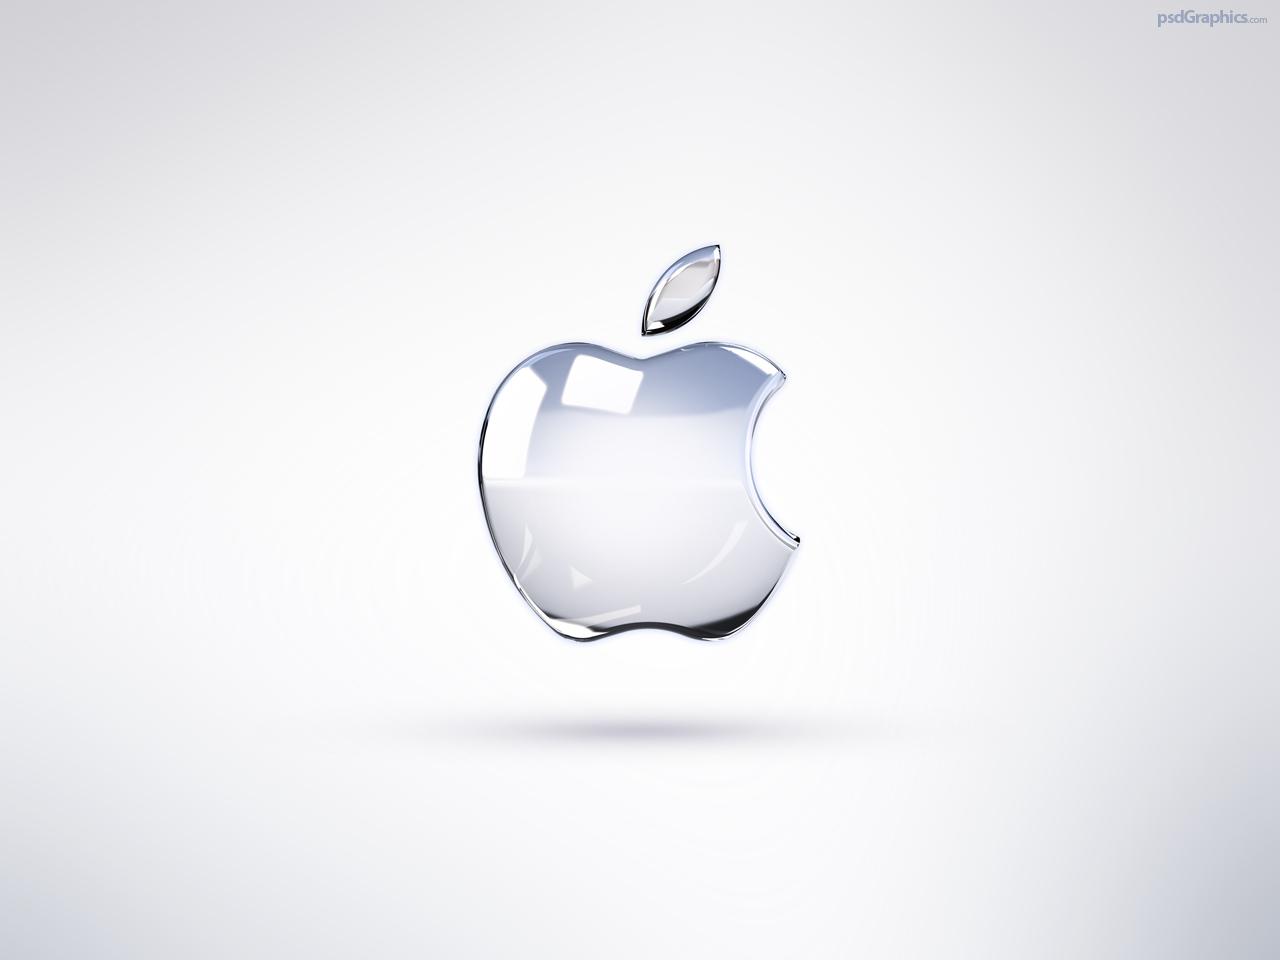 Bright Apple logo wallpaper PSDGraphics 1280x960